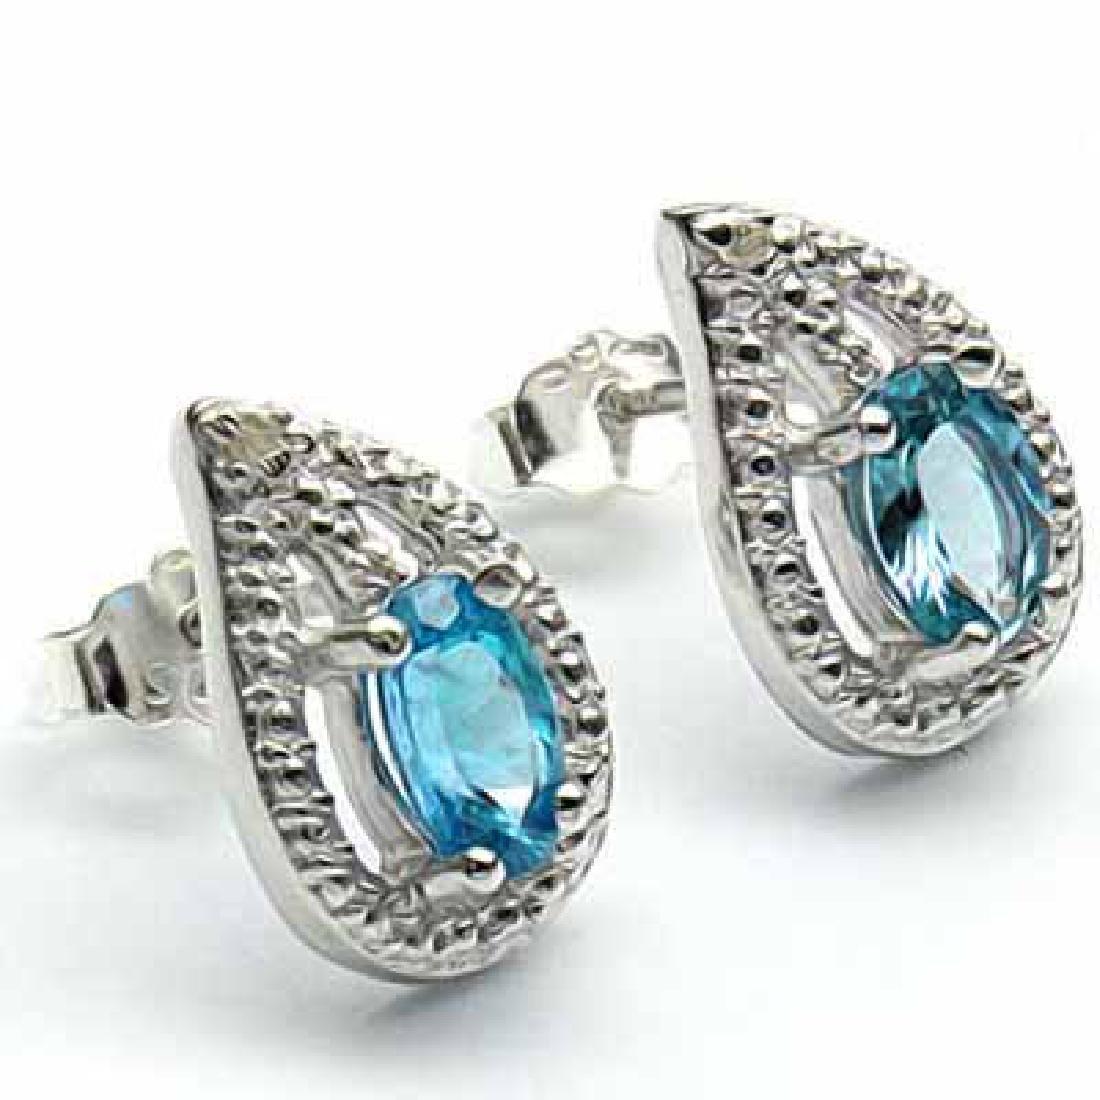 1 CARAT BABY SWISS BLUE TOPAZ & DIAMOND 925 STERLING SI